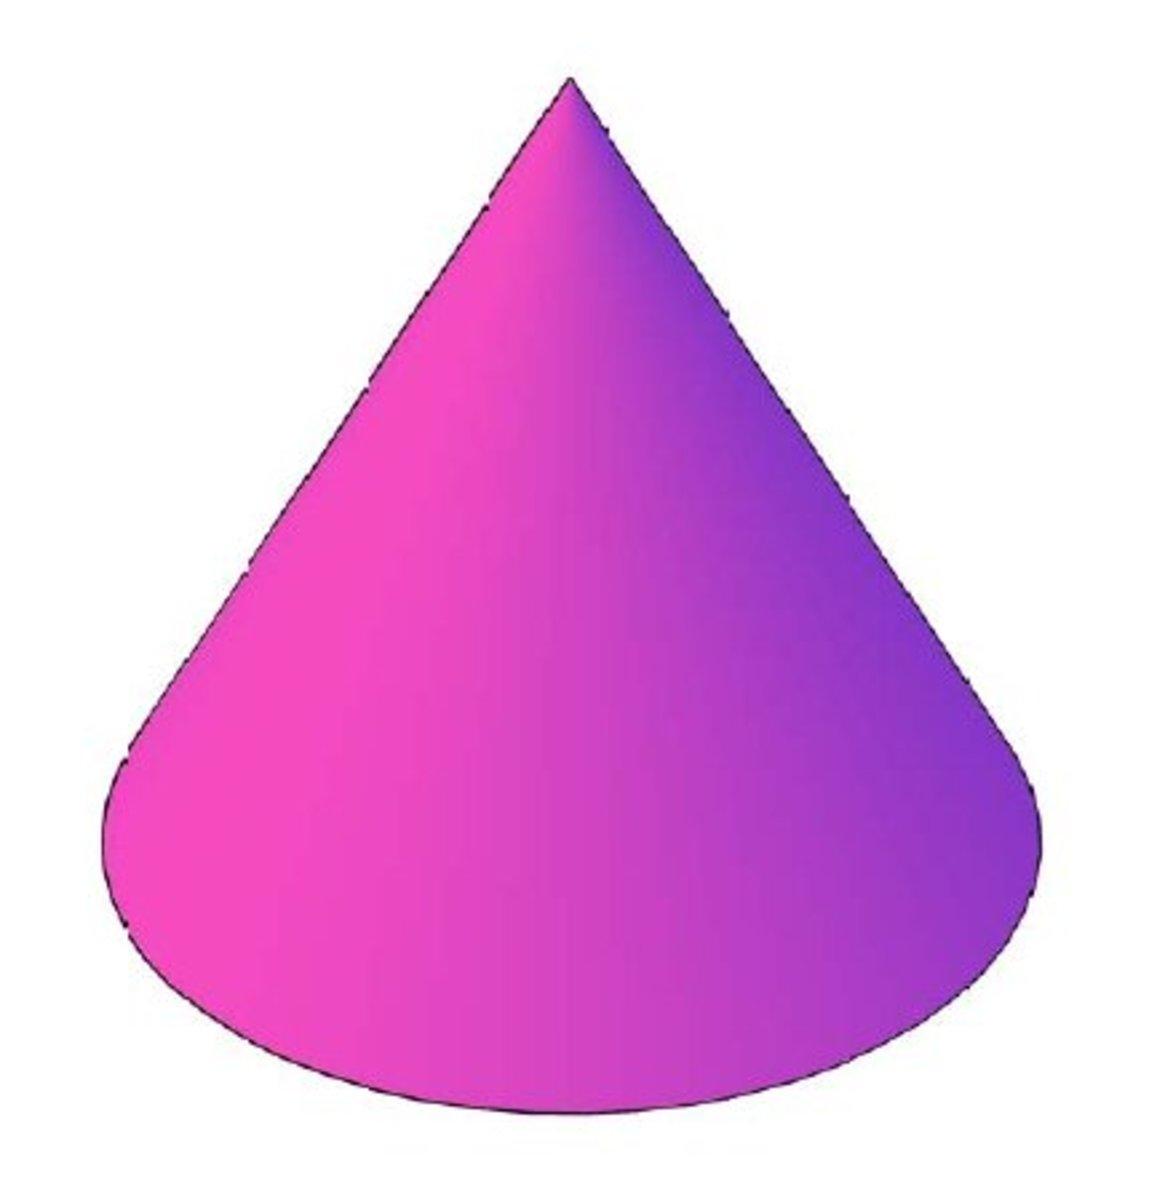 How to Develop a Cone - Cone Development